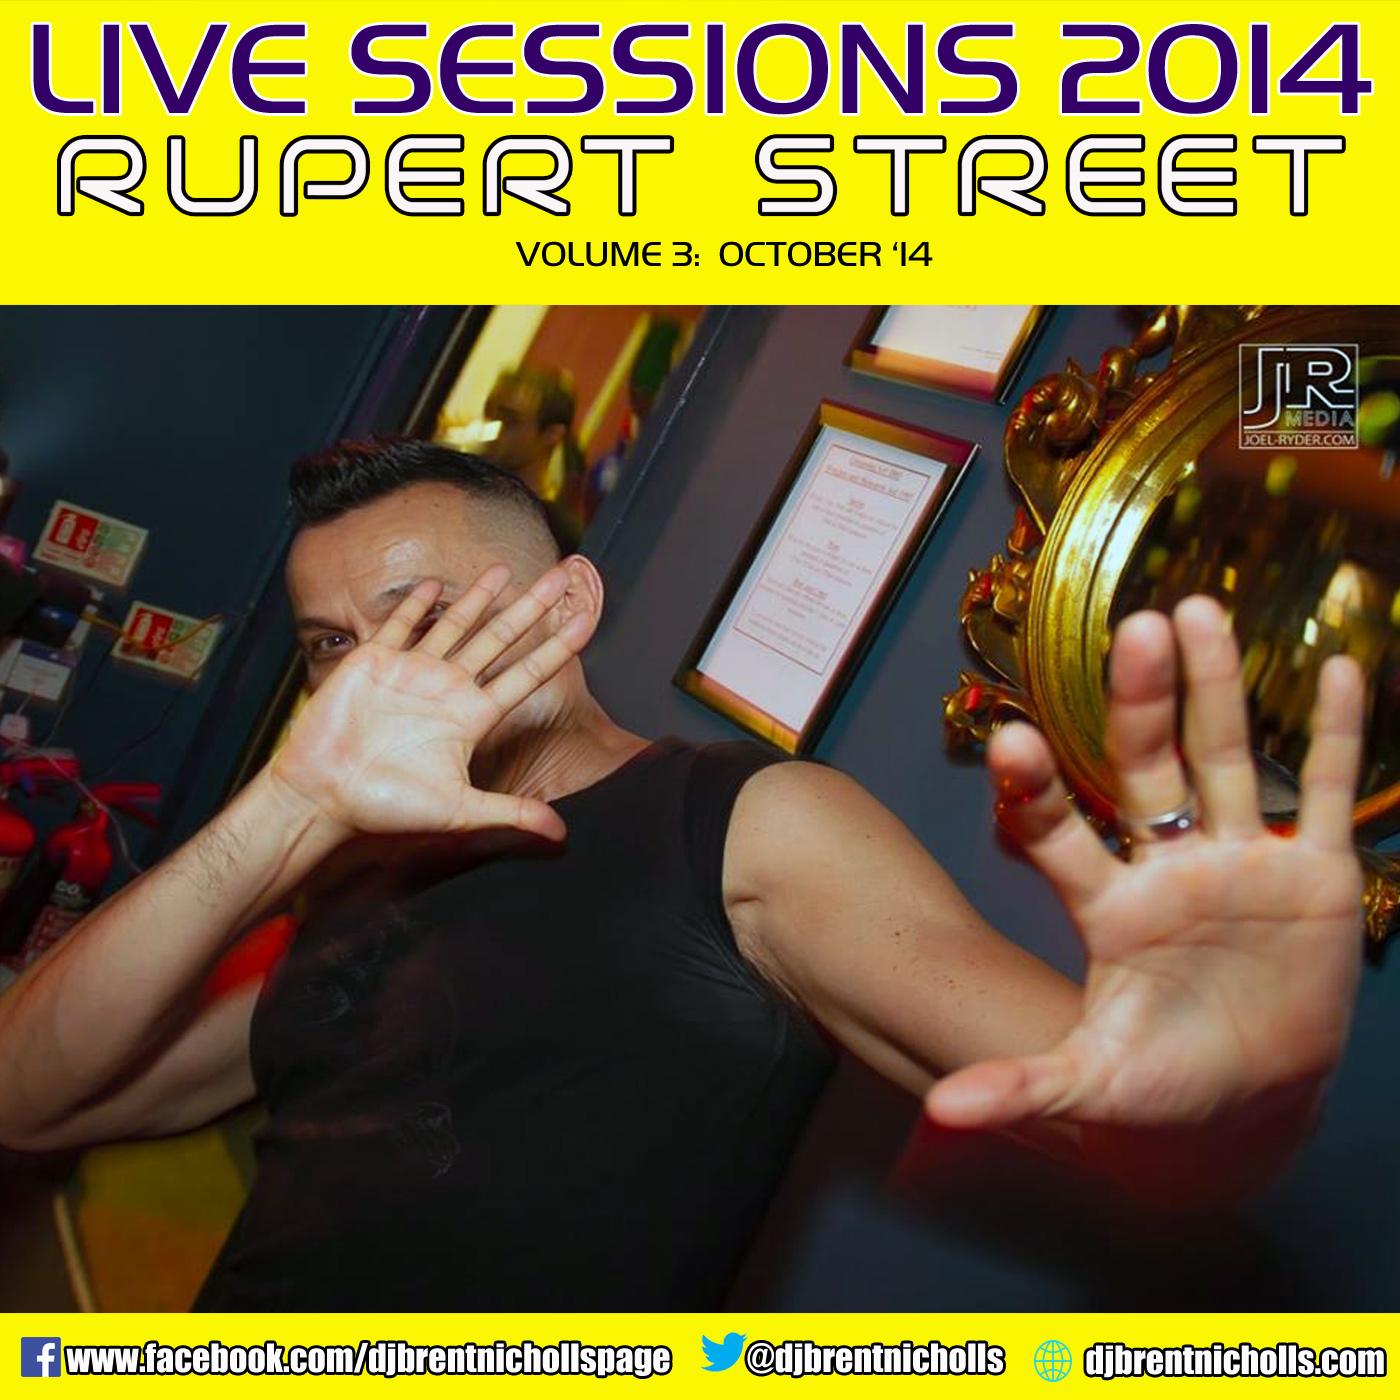 PODCAST: LIVE SESSION 2014- RUPERT STREET (OCT 2014)